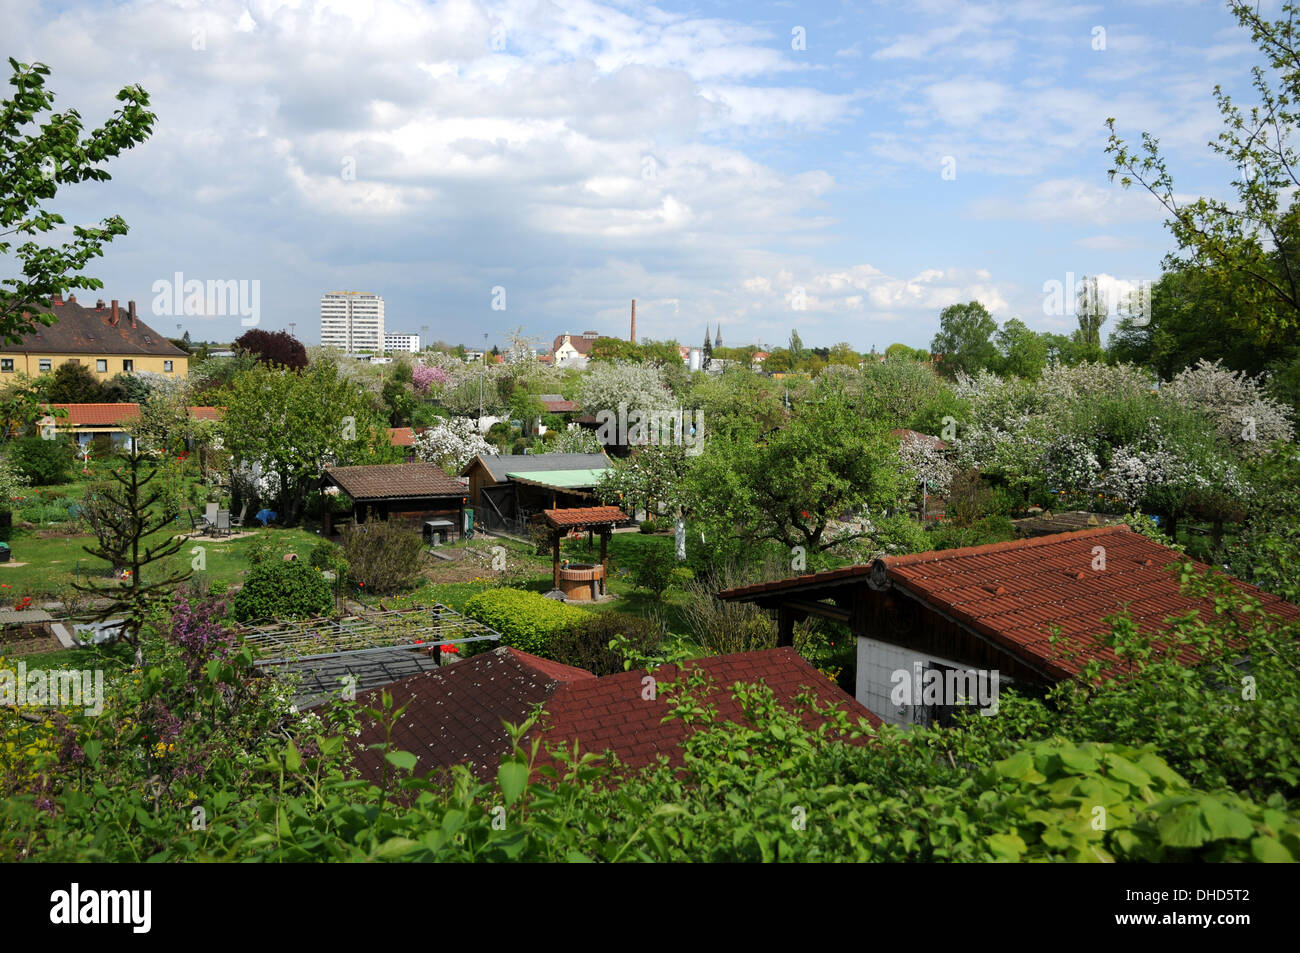 Community Gardens Stock Photo